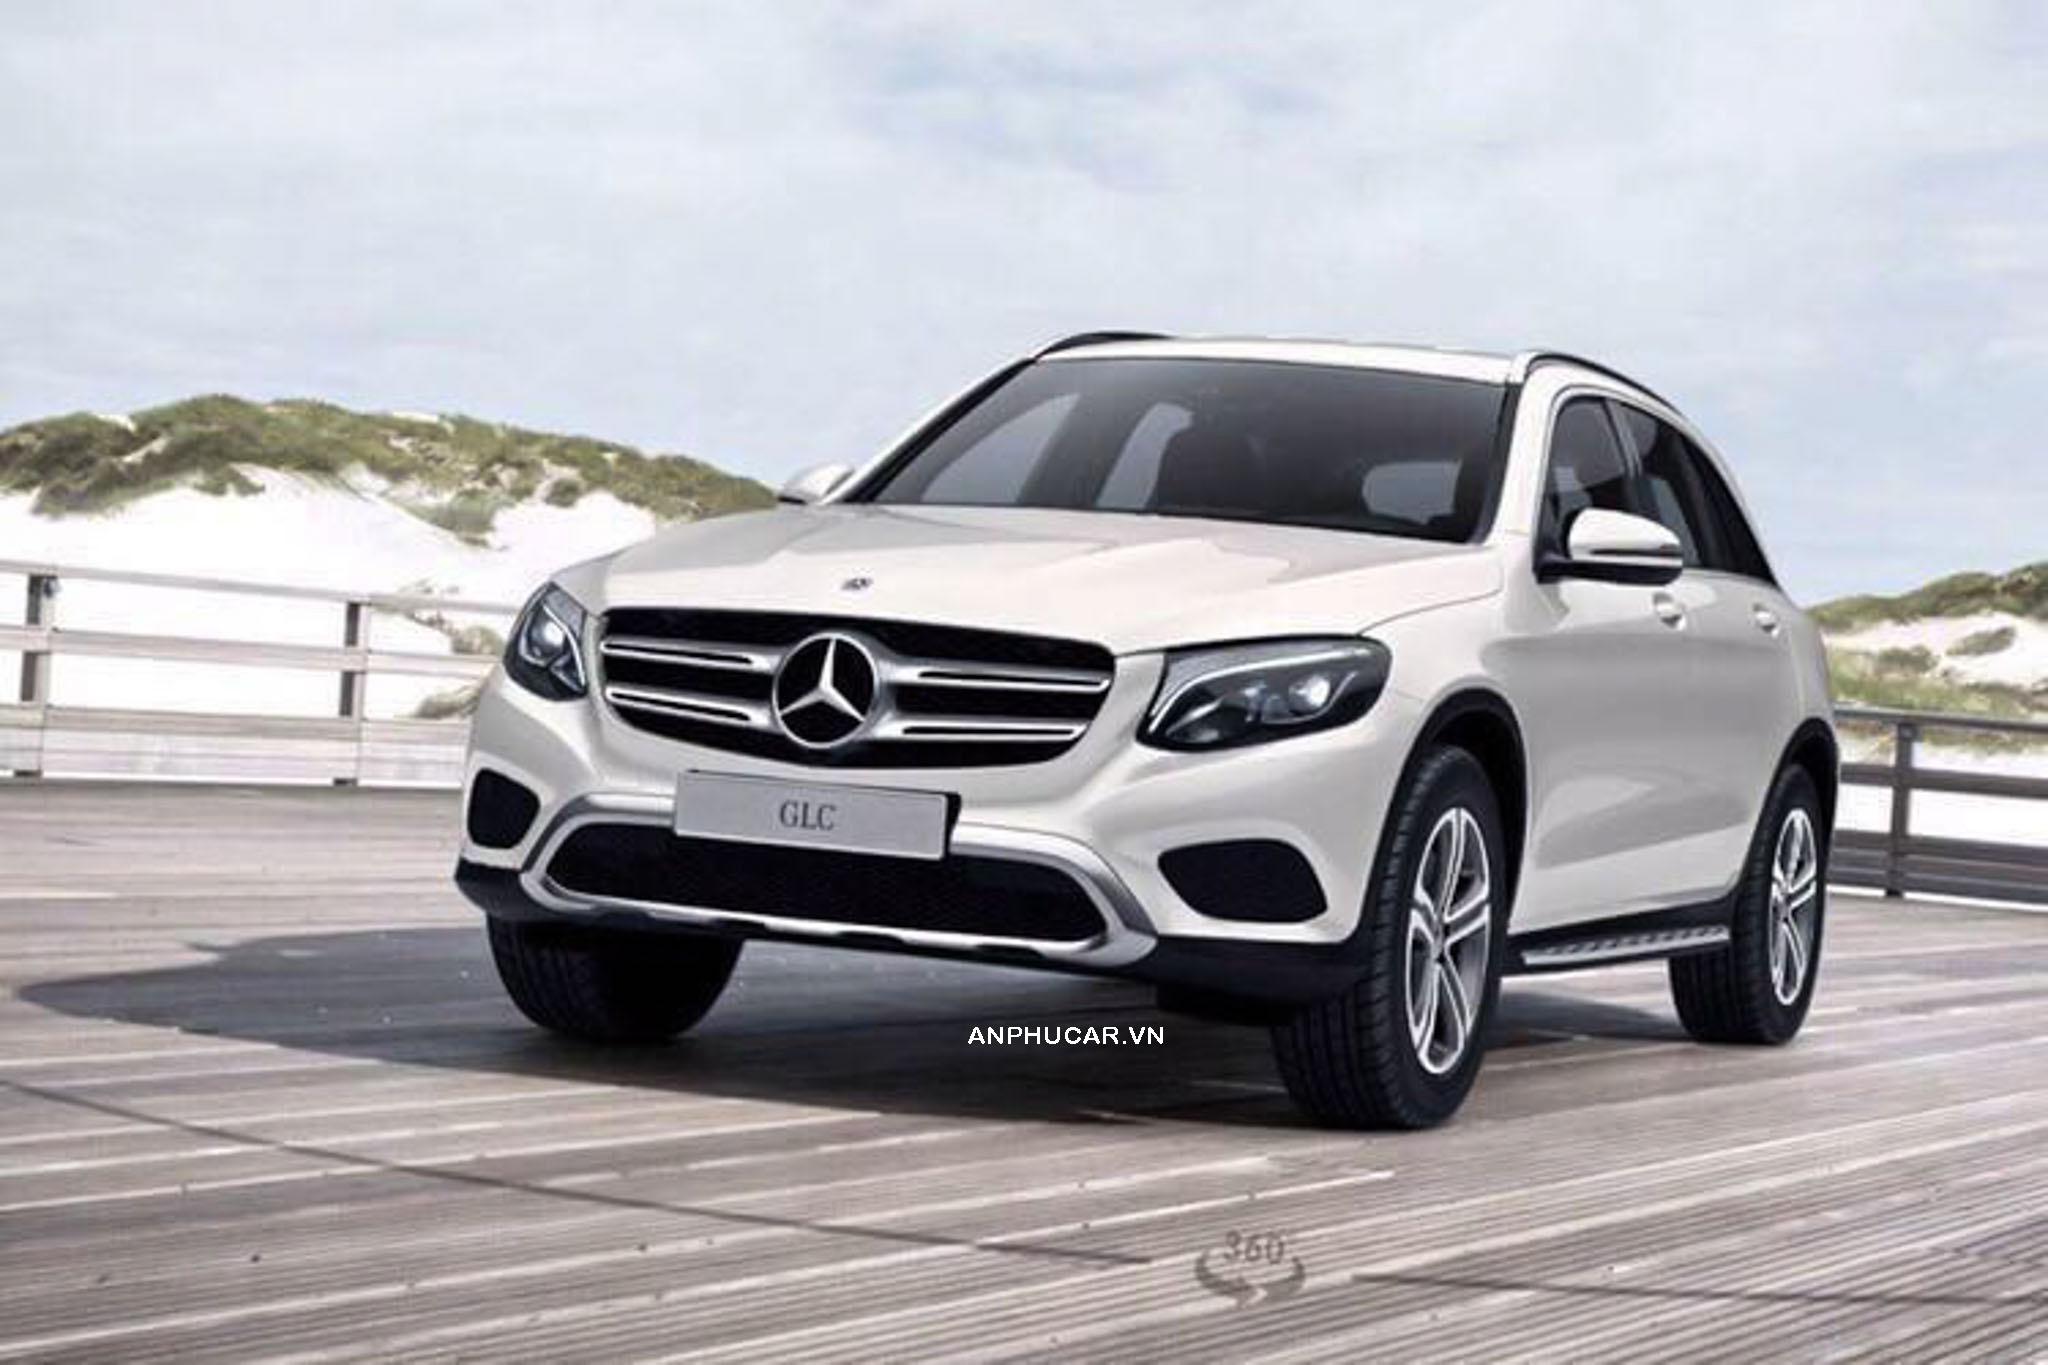 Mercedes-Benz GLC 200 chiếc xe cho mọi nhà